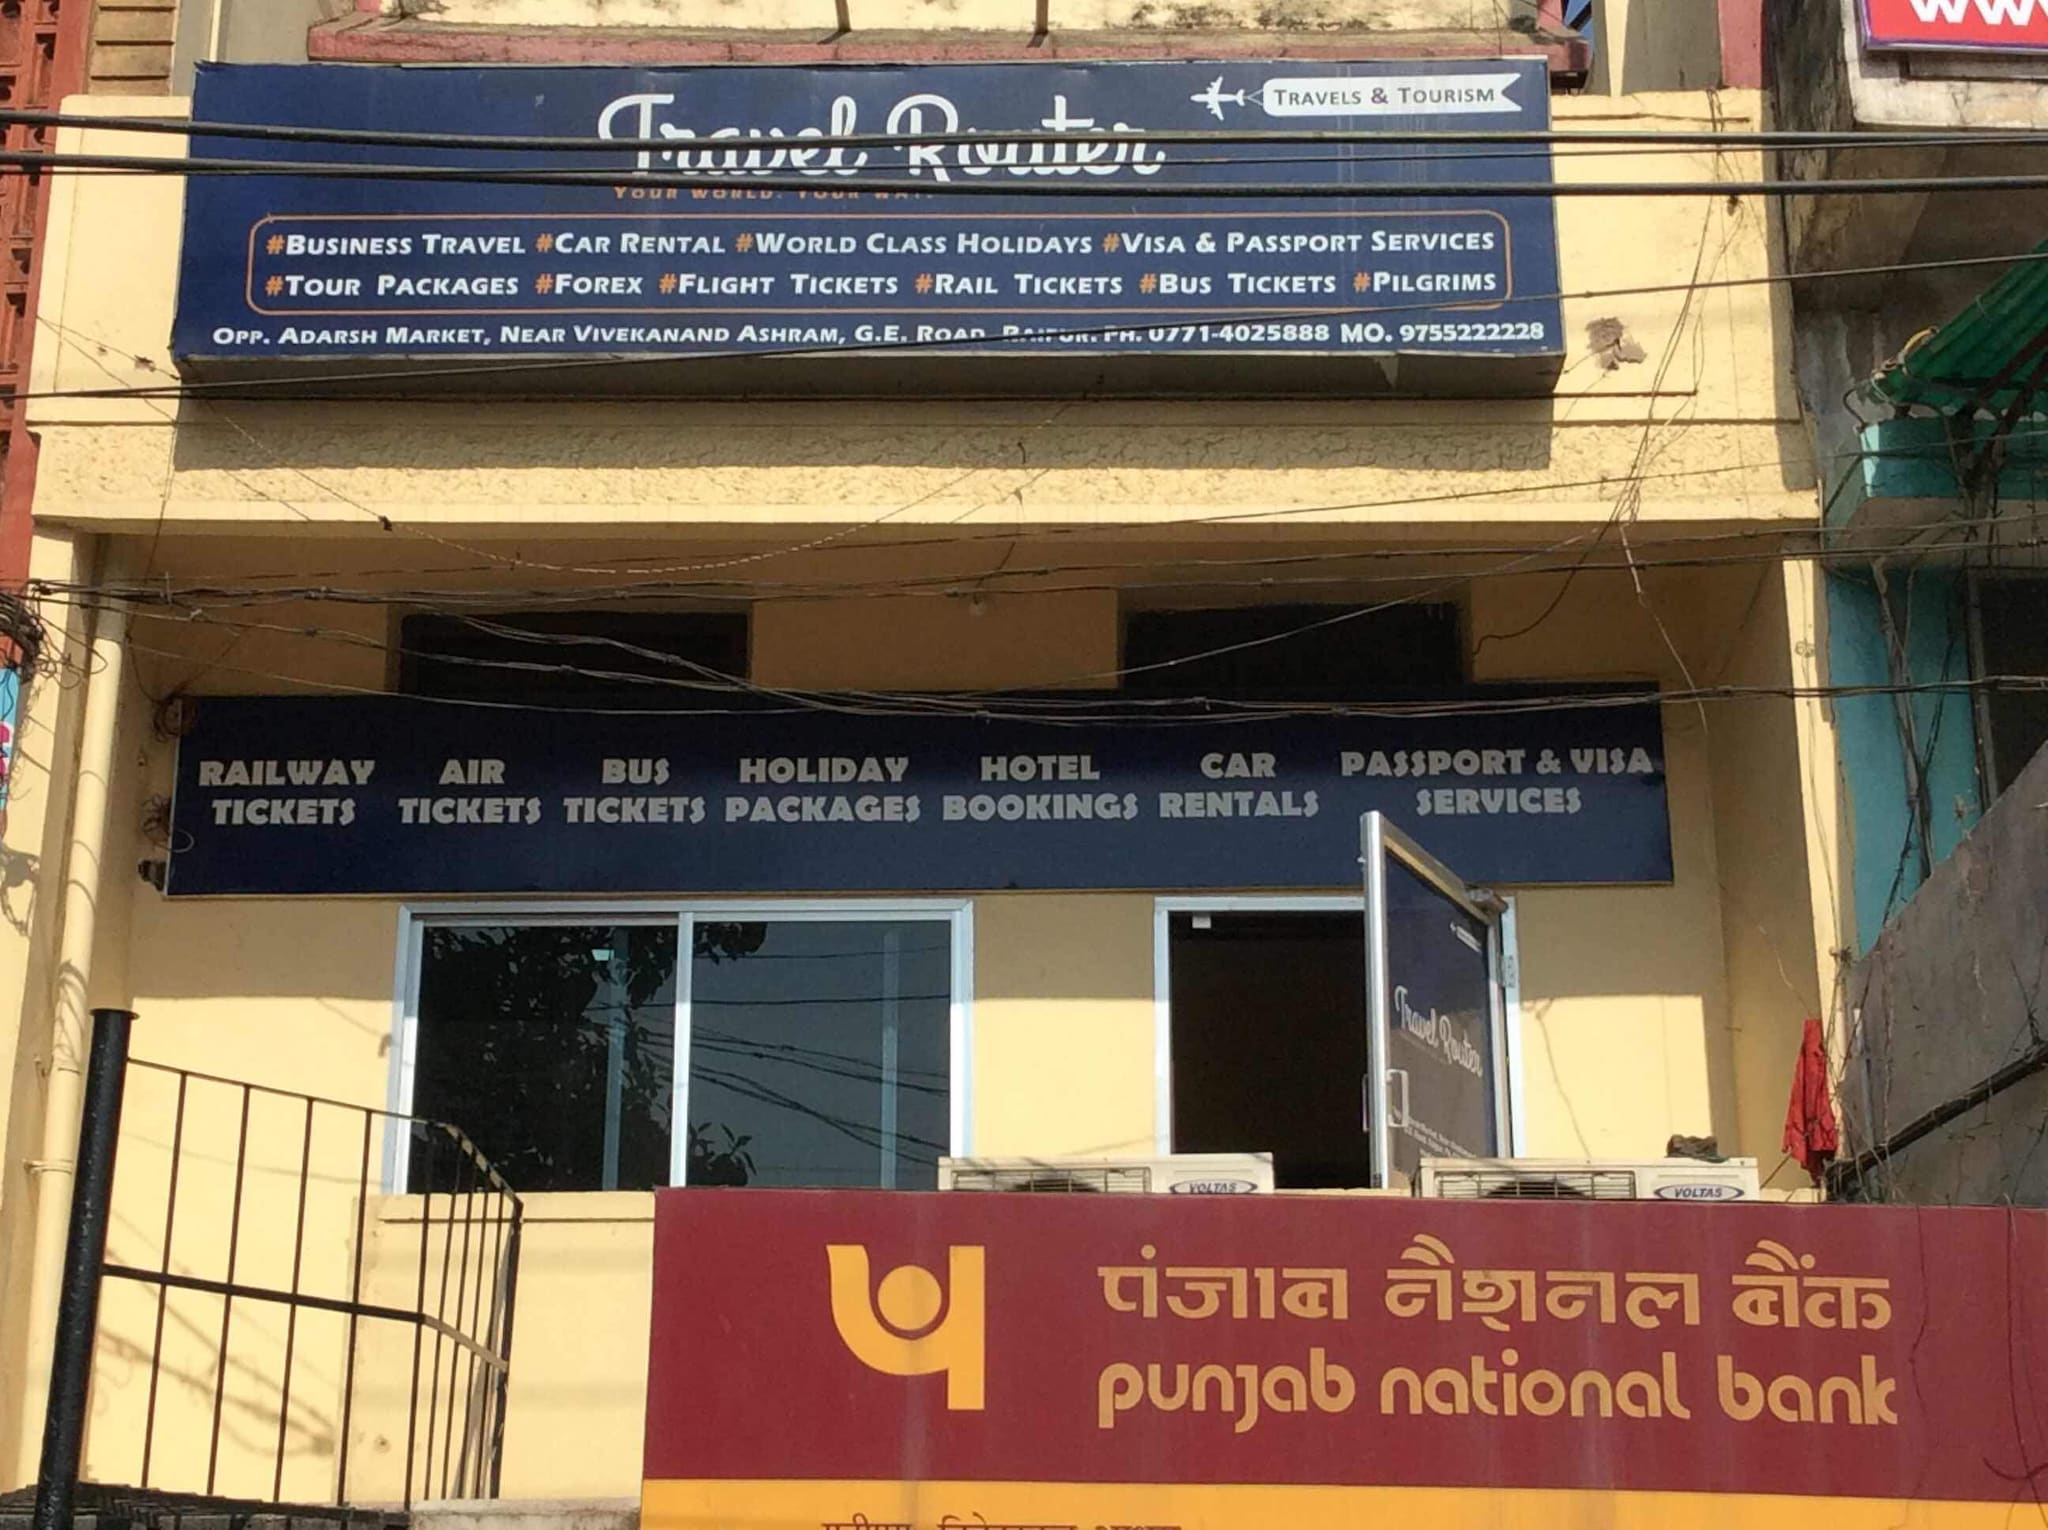 Top 10 Western Union Money Transfer Agencies in Raipur-Chhattisgarh